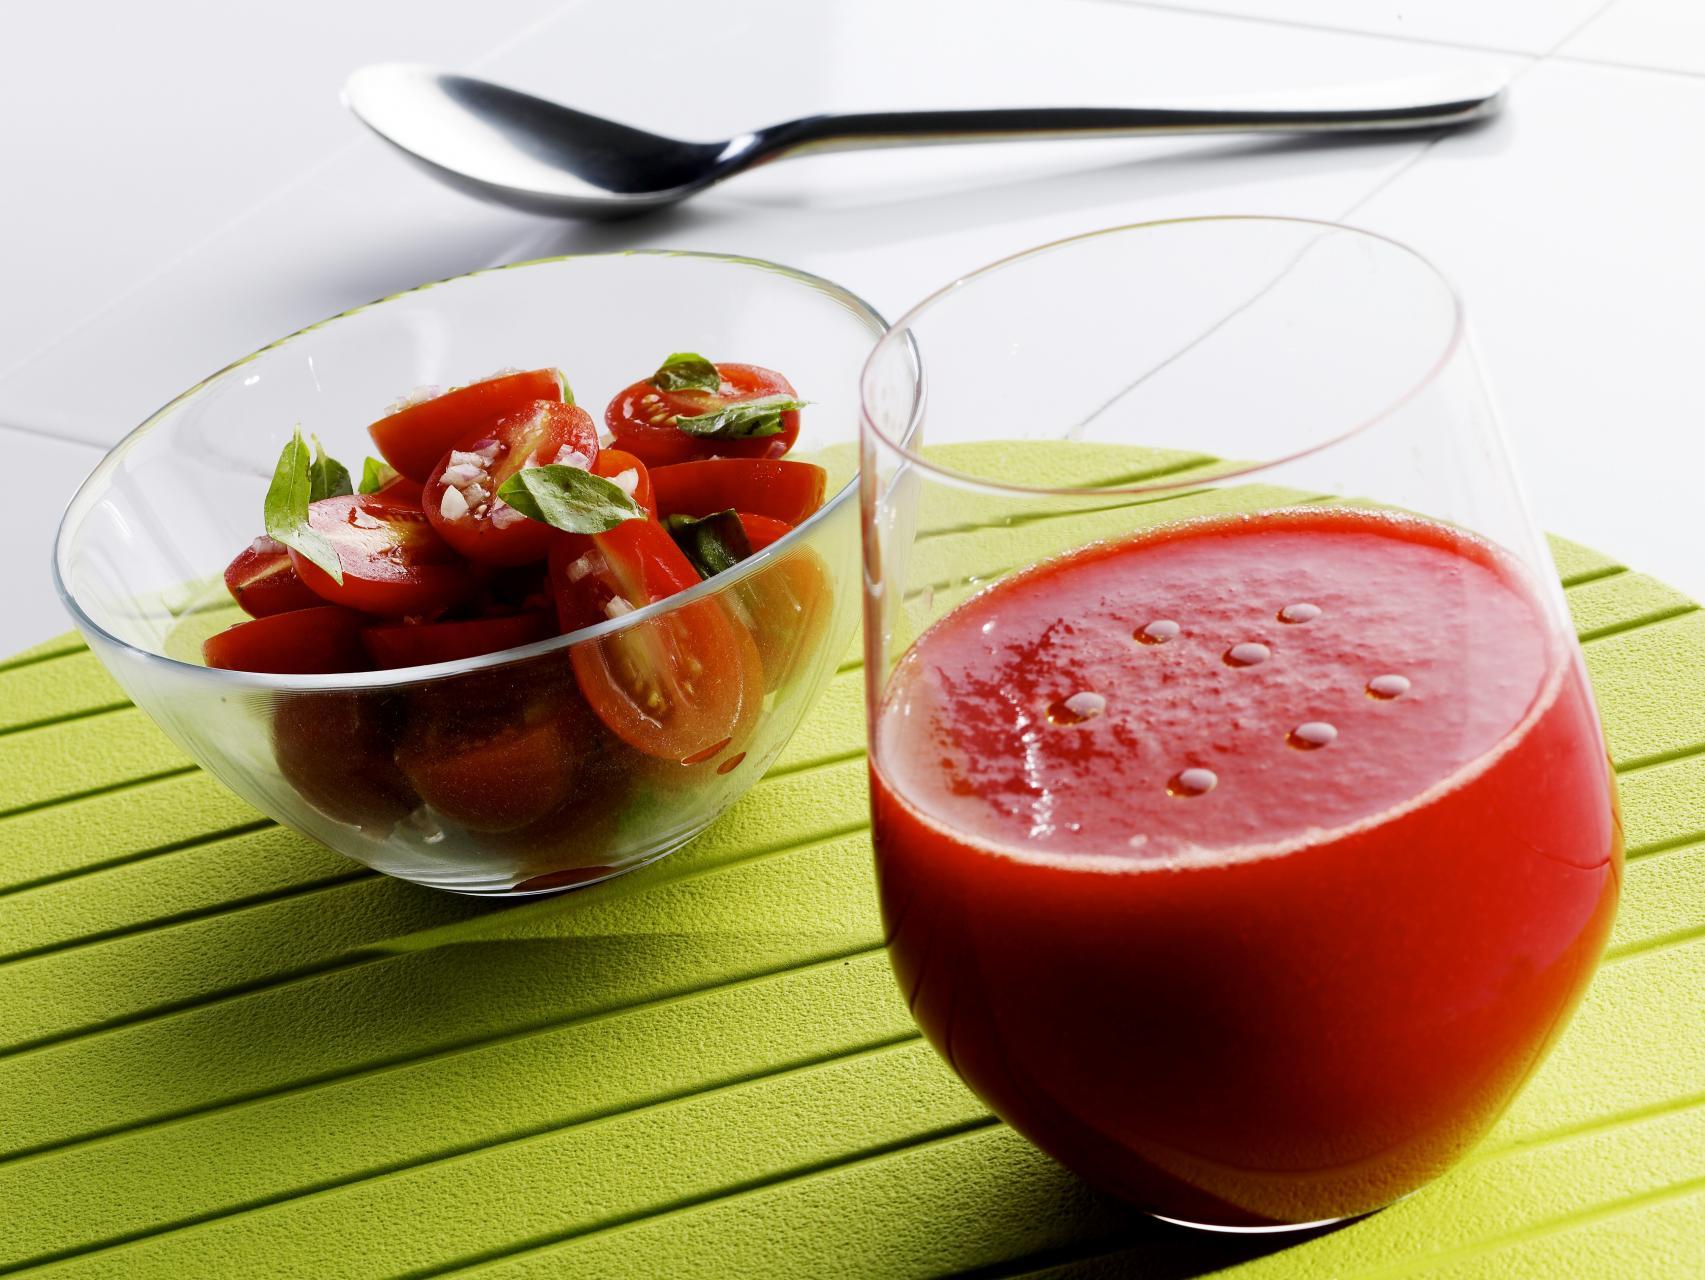 Watermelon Gazpacho with a simple cherry tomato salad